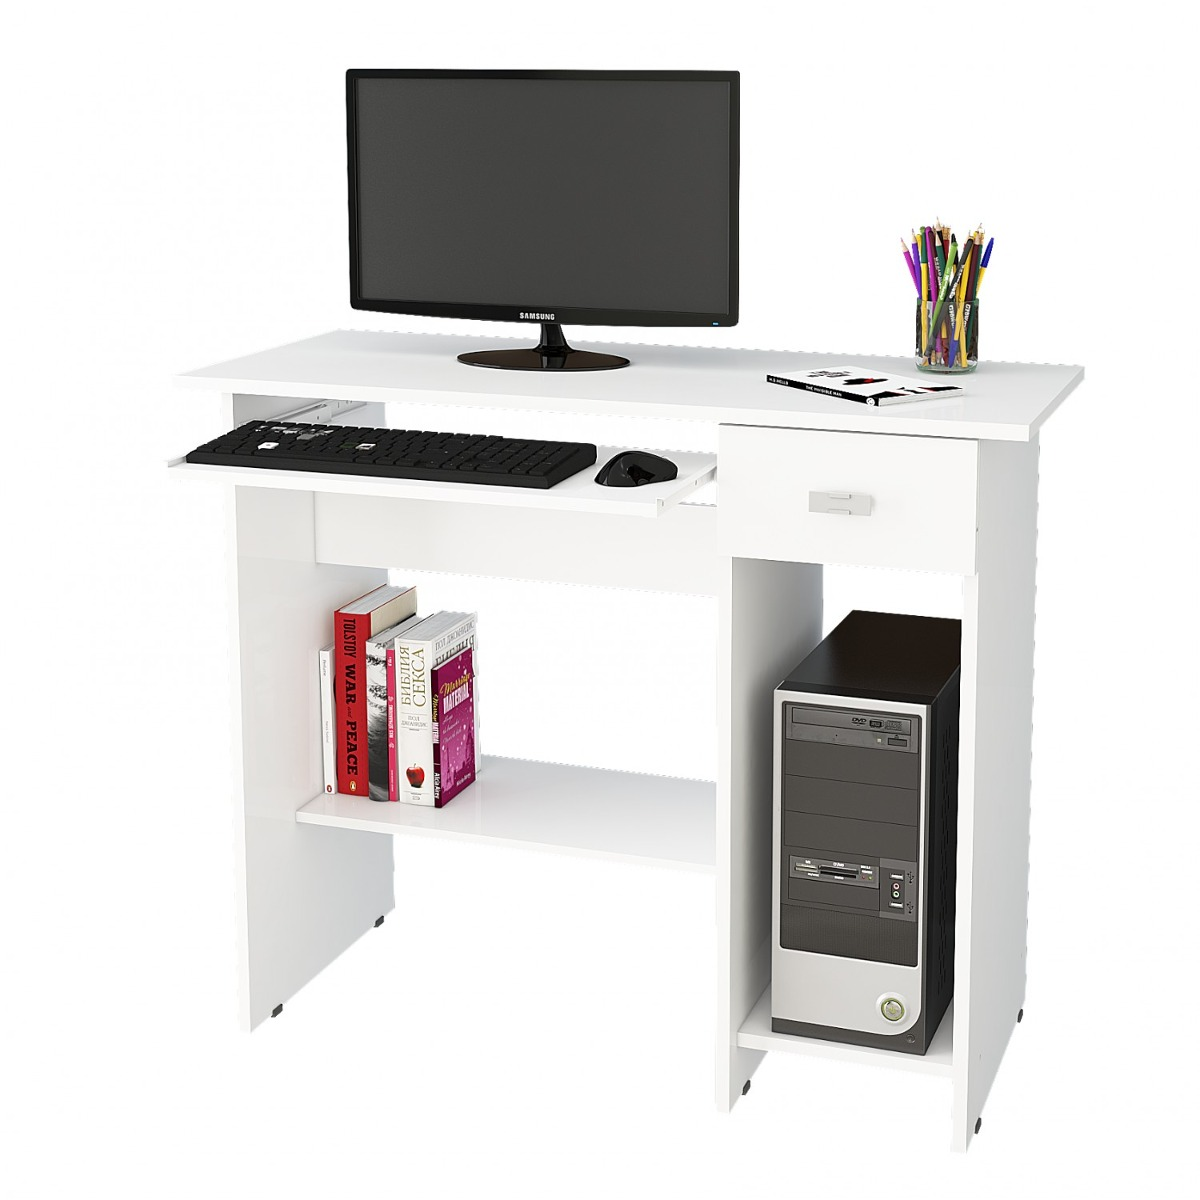 d2d81a678 mesa para computador alice permobili branco hd. Carregando zoom.